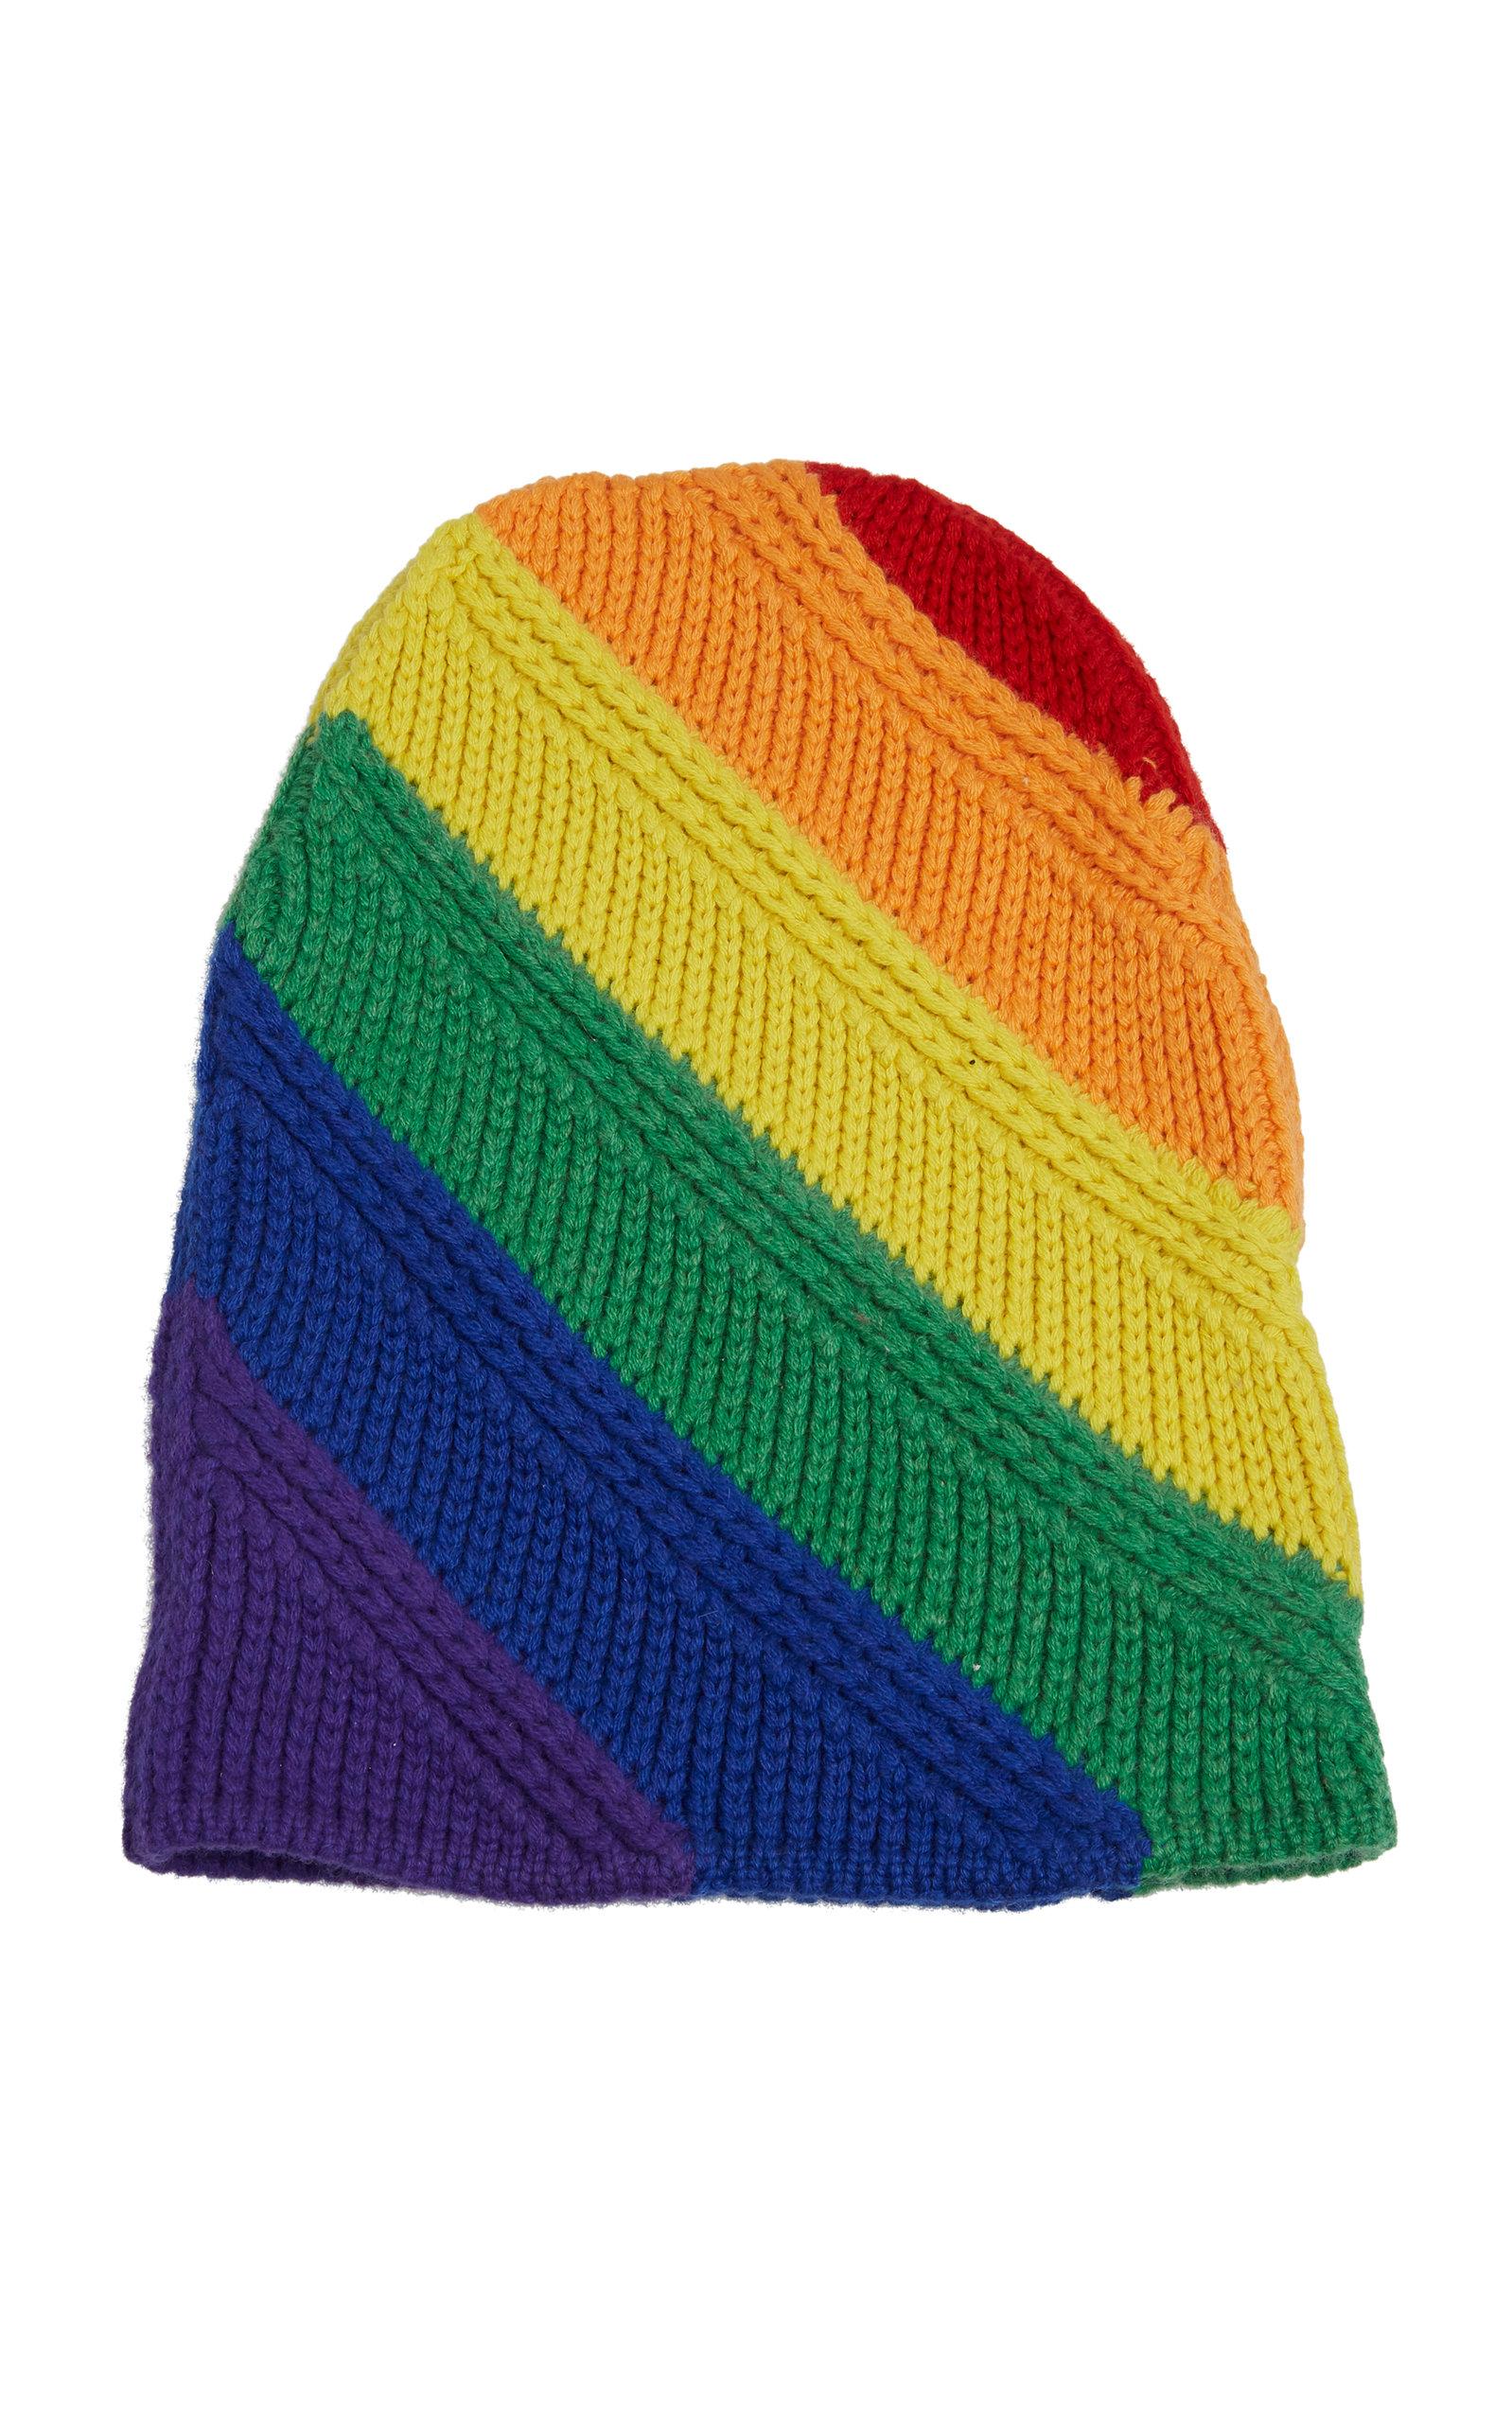 10b6233b564 Rainbow Stripe Knitted Beanie by Burberry